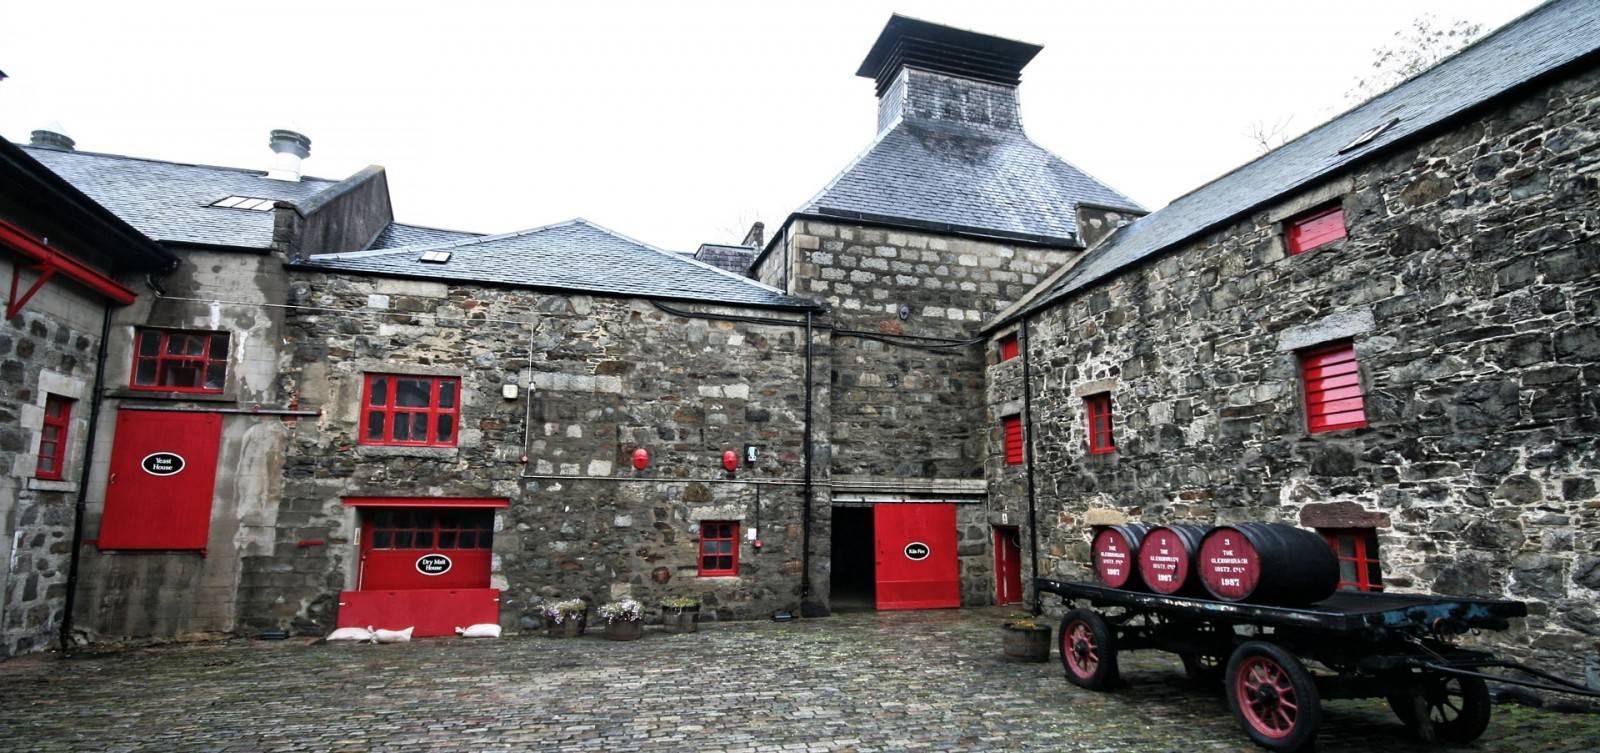 GlenDronach Kiln und Maltings